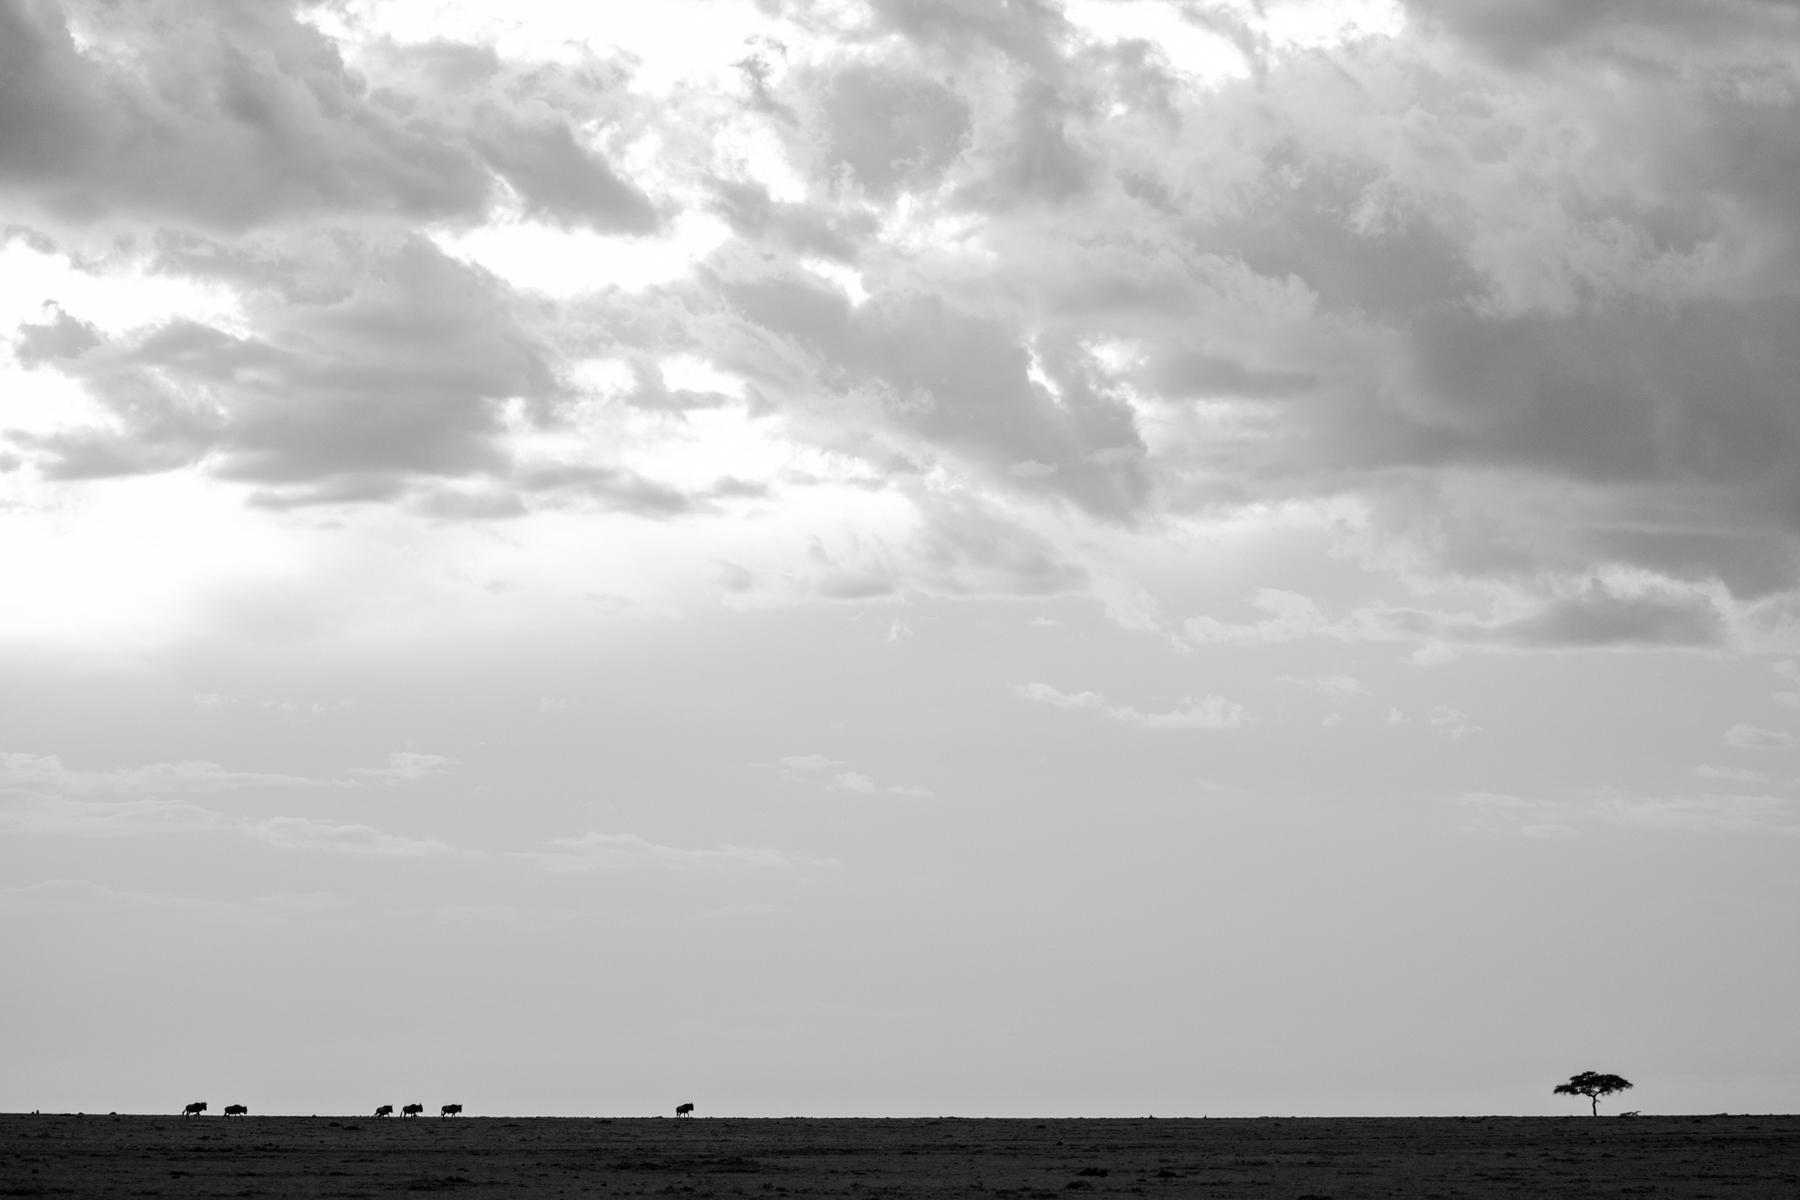 KenyaFeb2019_Safari-43.jpg